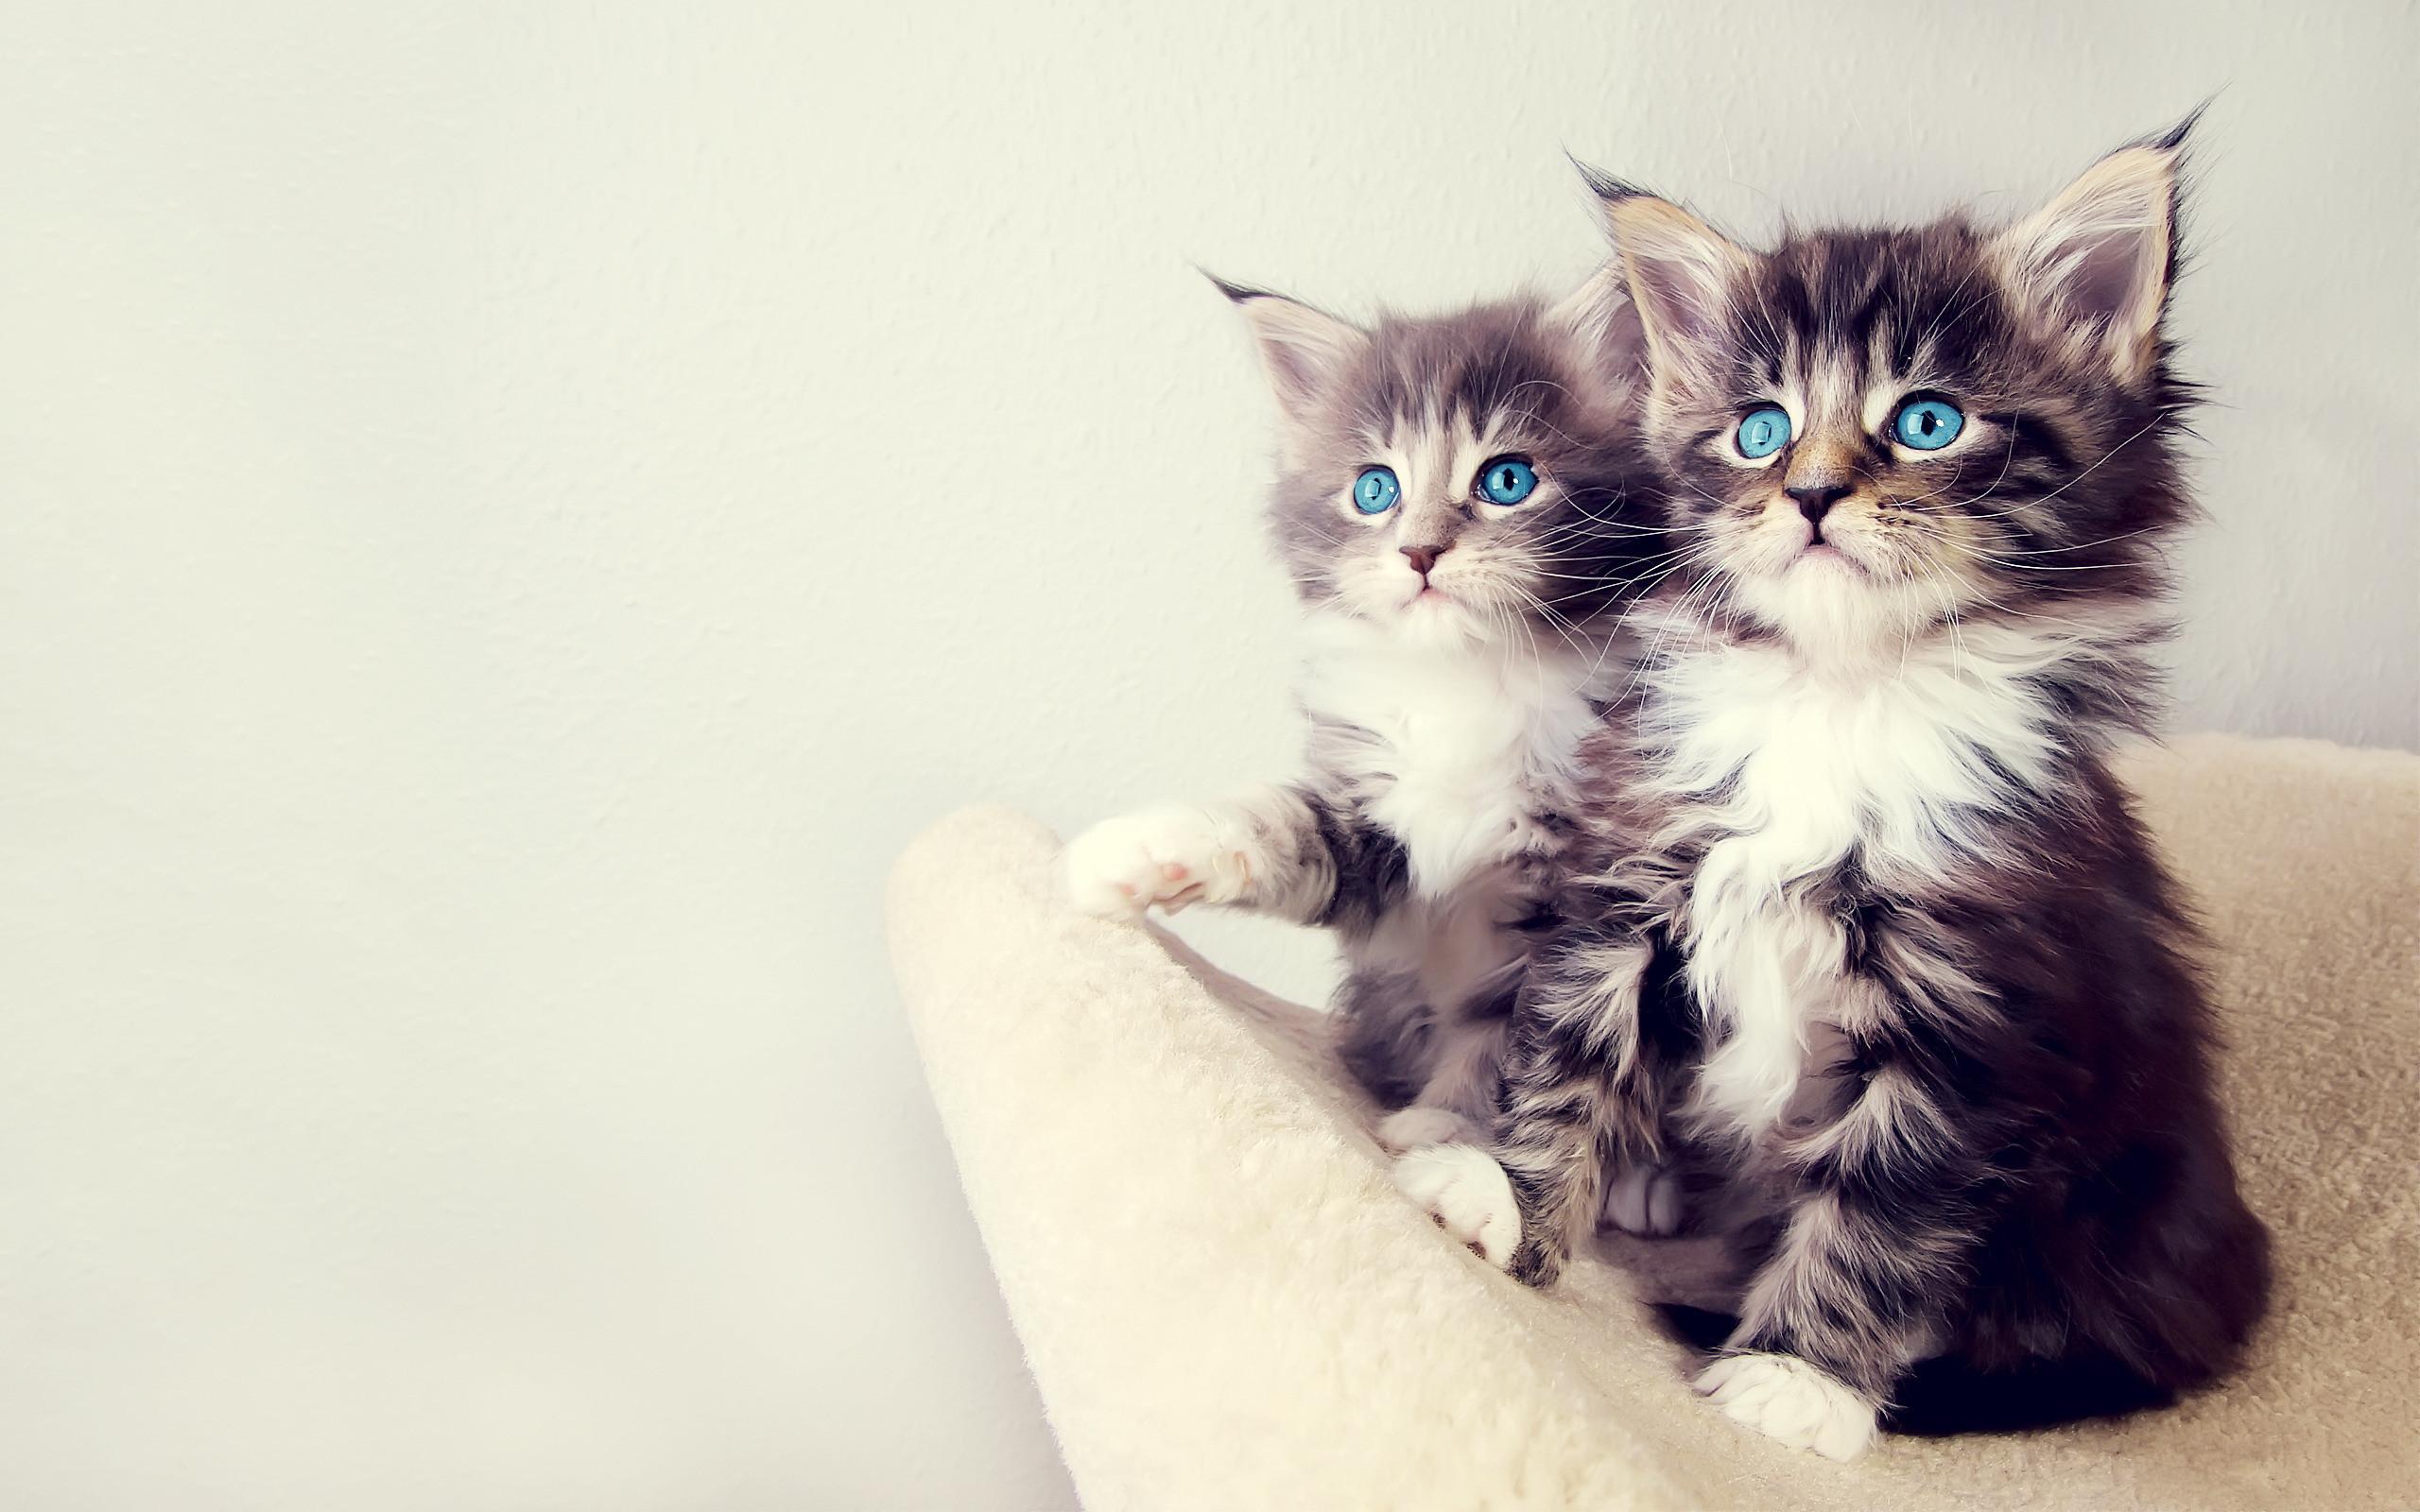 … cats wallpaper hd wallpapers pulse …